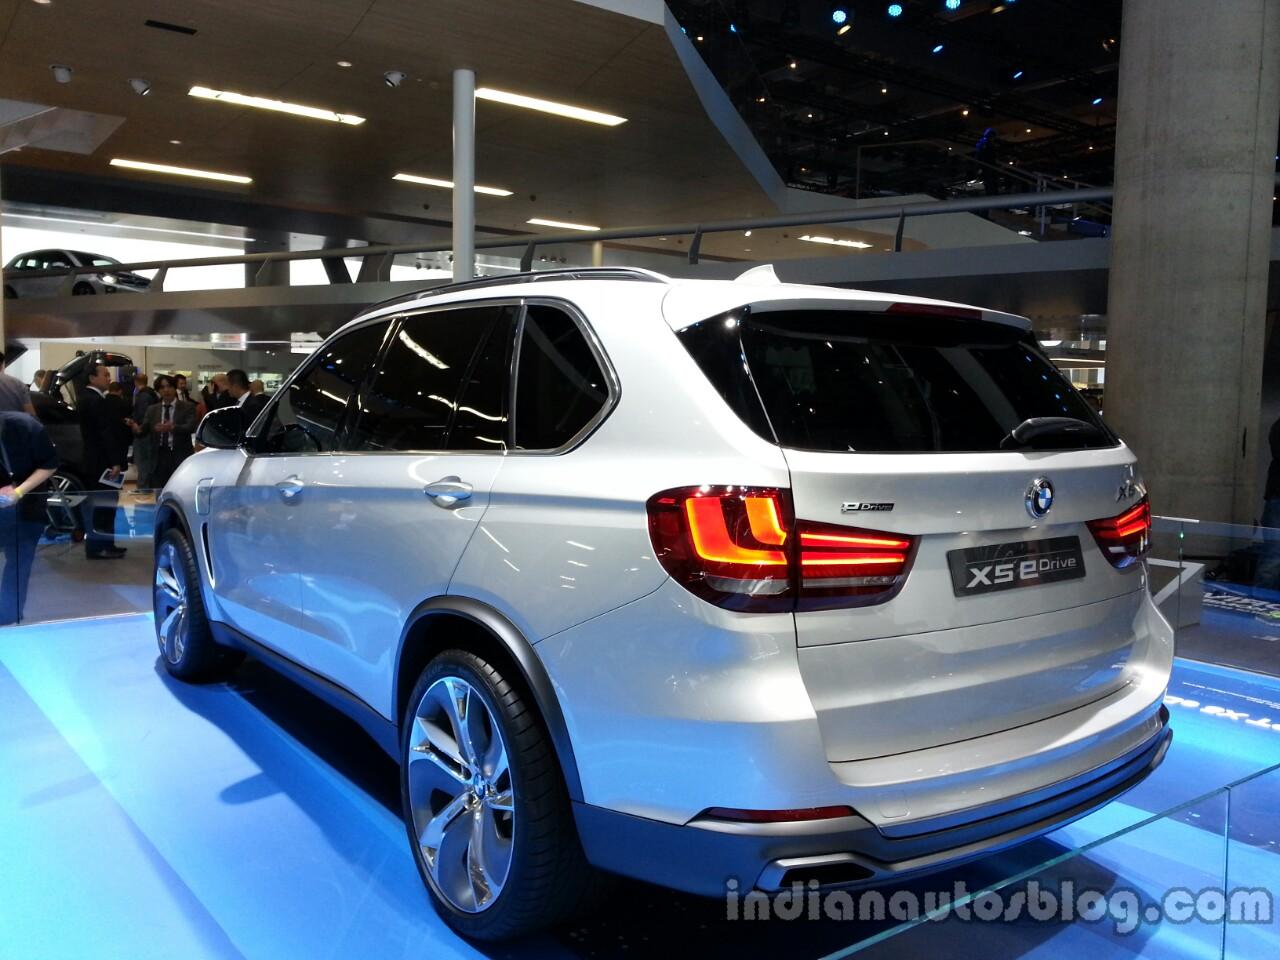 BMW X5 eDrive Rear Left